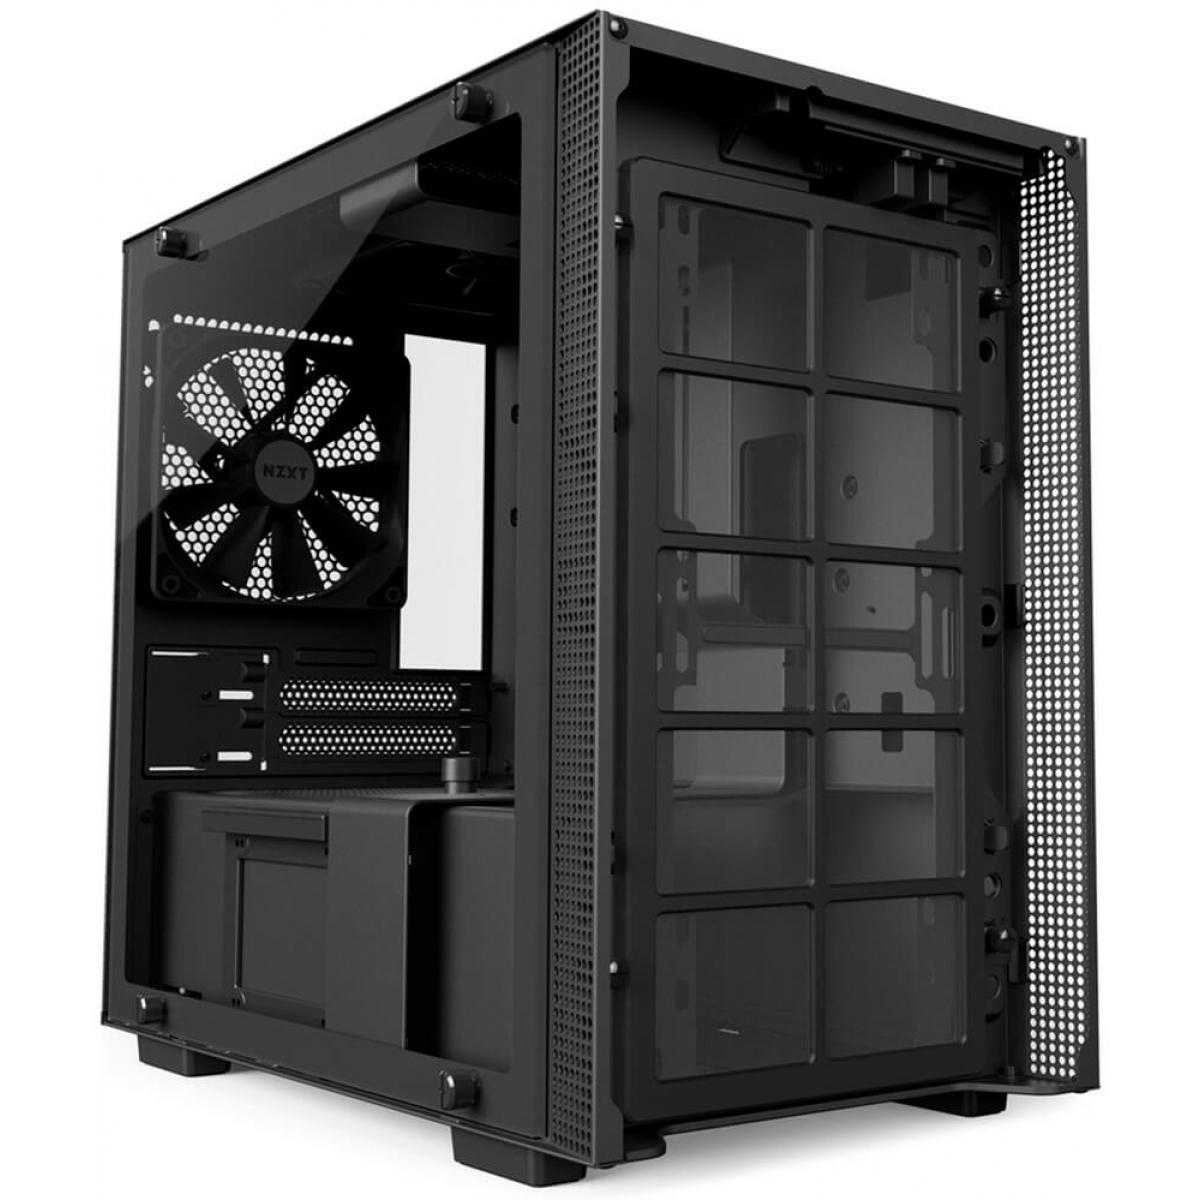 Gabinete Gamer NZXT H200, Mini Tower, Com 2 Fans, Vidro Temperado, Black, Sem Fonte, CA-H200B-B1